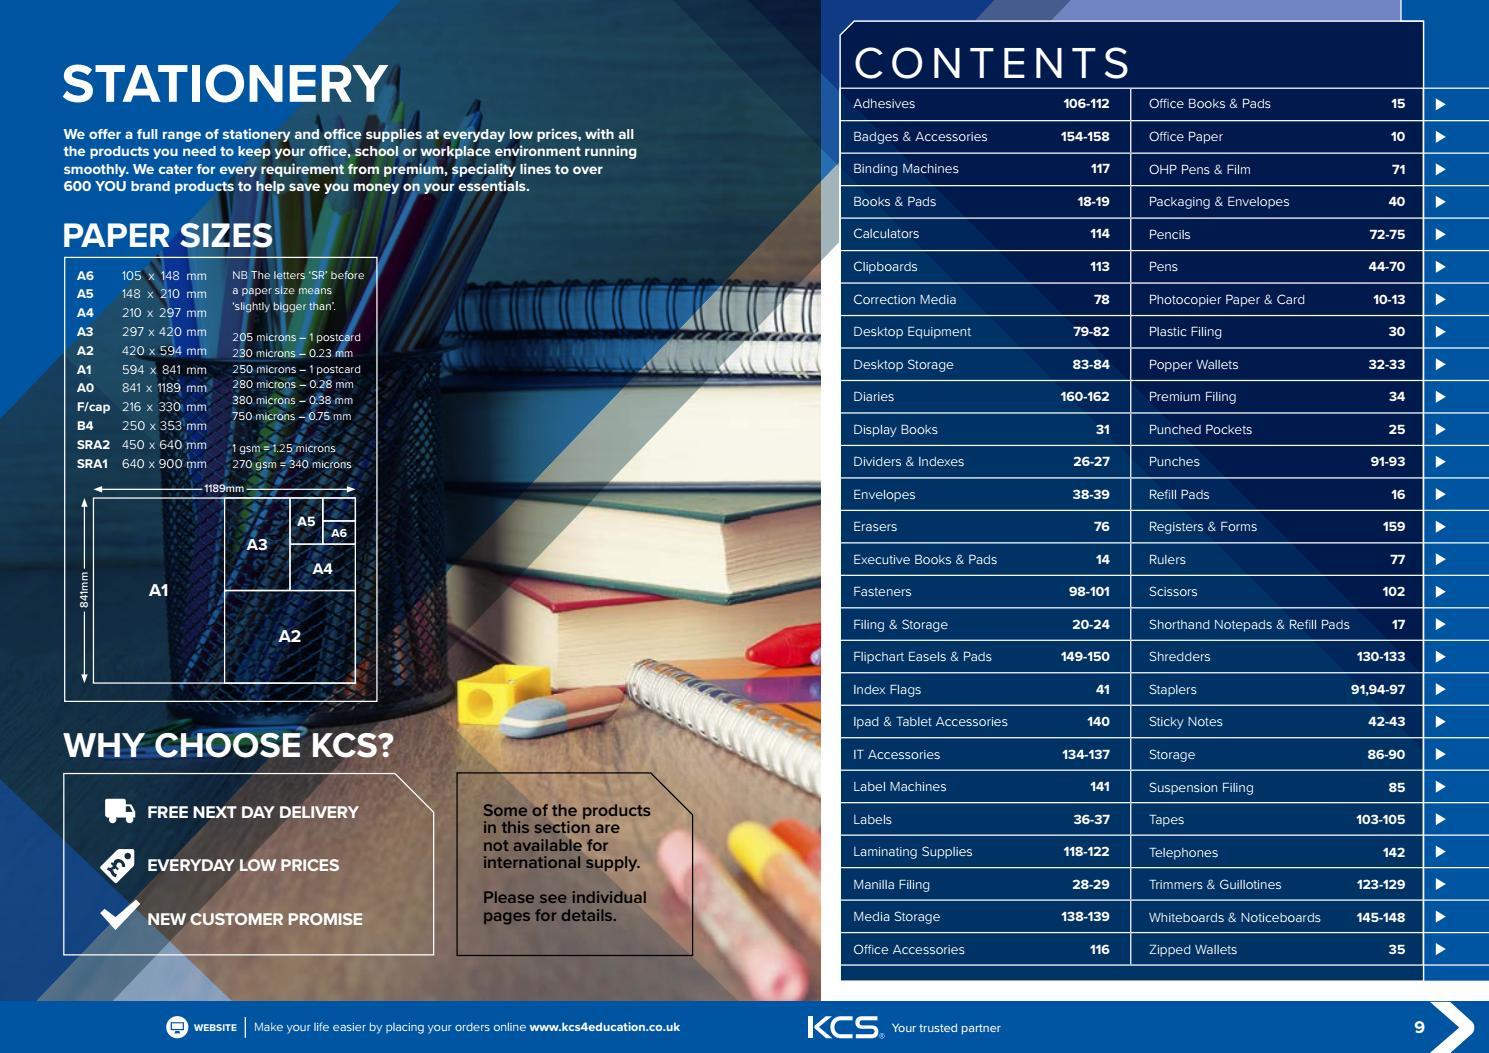 Kcs Catalogue Stationery 2017 18 By Uk Issuu Staedtler Triplus Color Fibre Tip Pen 323 34 Aqua Blue